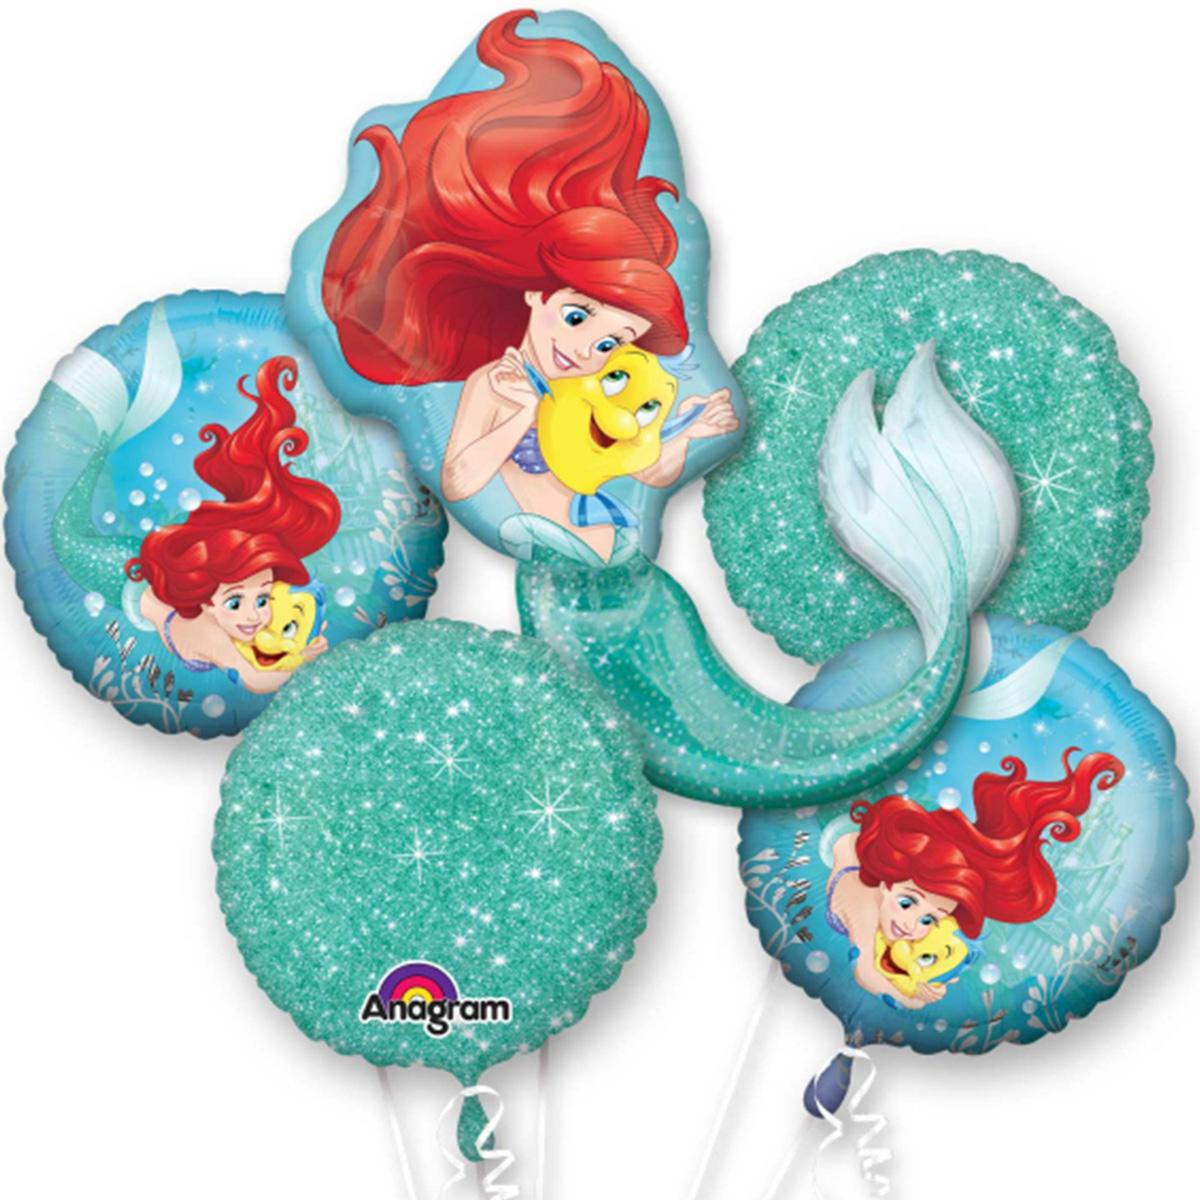 Little Mermaid Ariel Character Authentic Licensed Theme Foil Balloon Bouquet